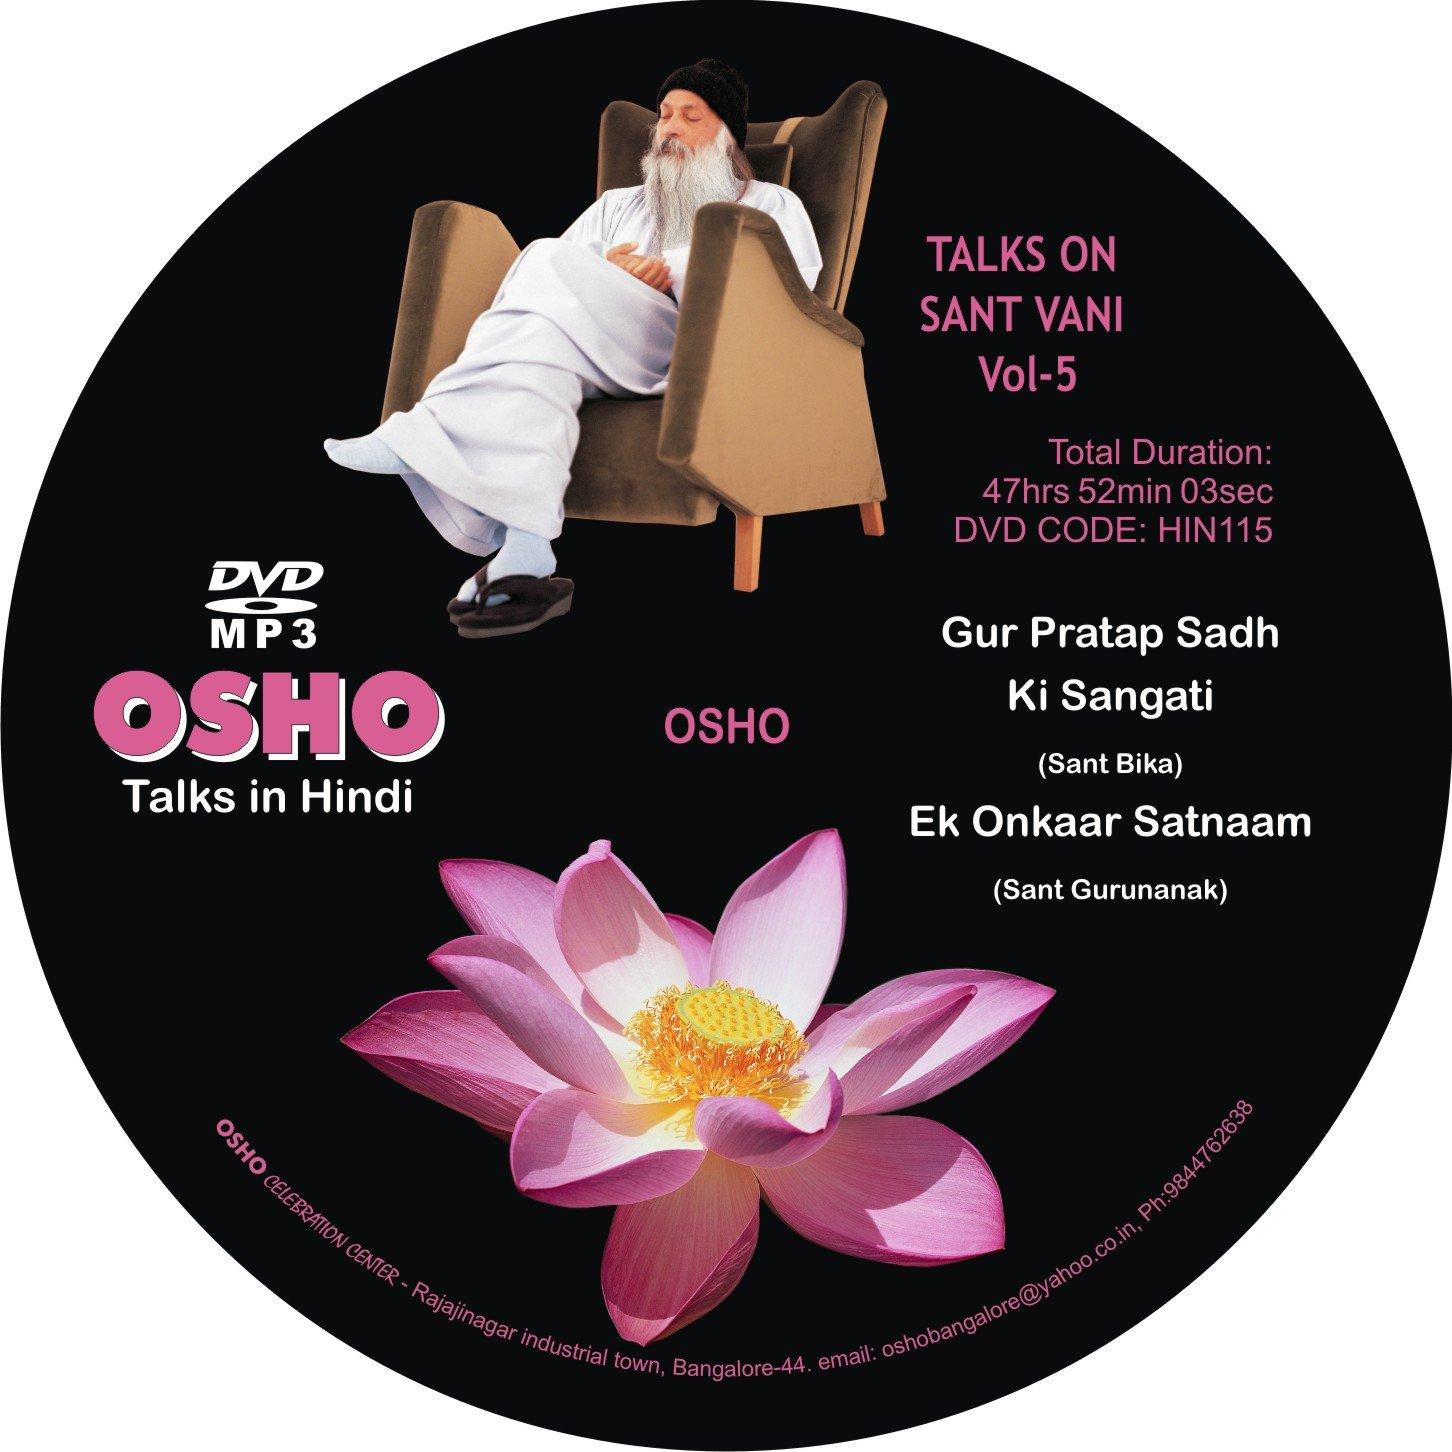 Buy Osho Hindi Talks On Different Mystics Teachings Vol 1313 Hrs